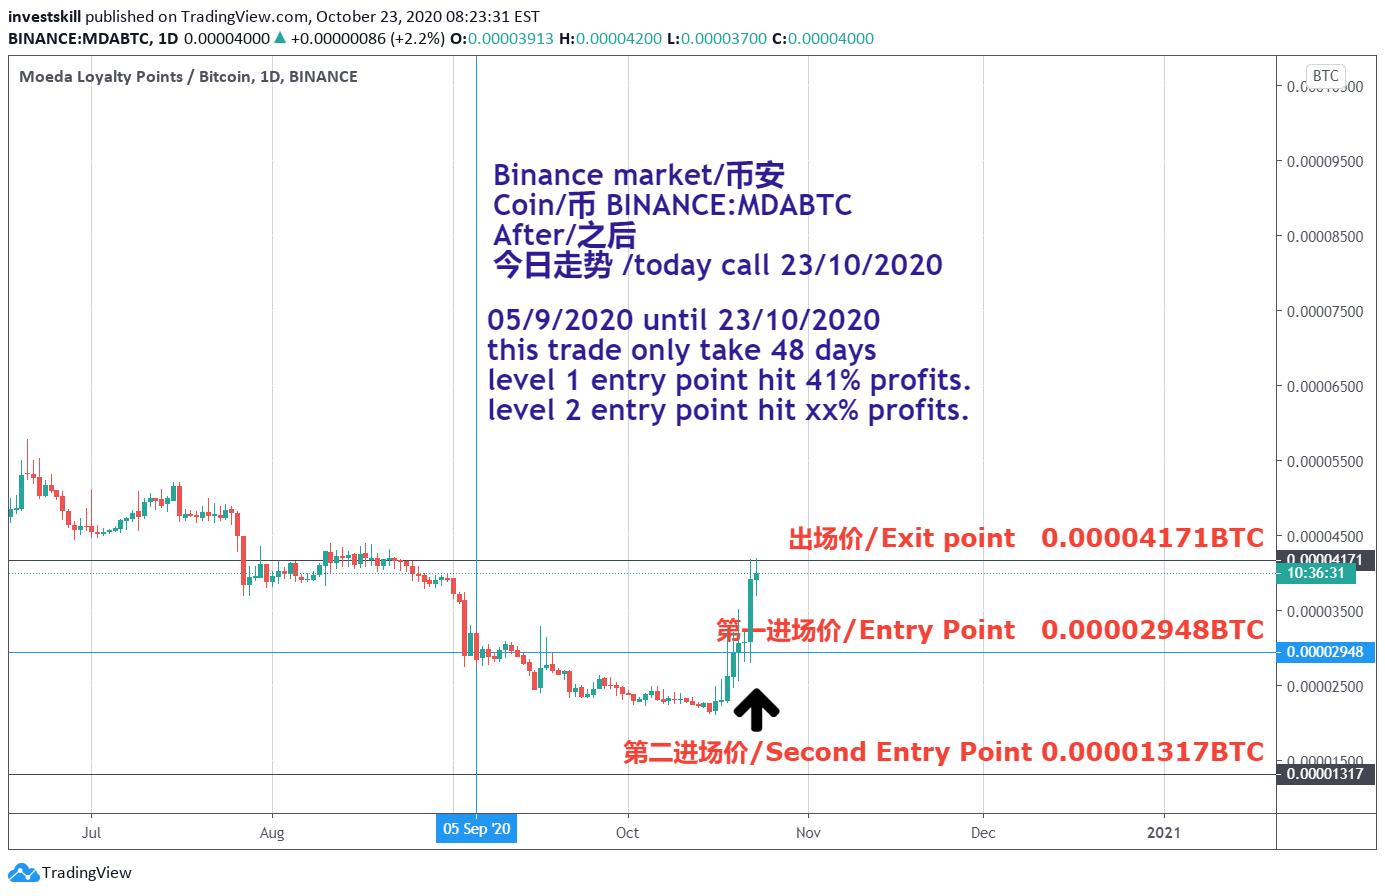 mda btc tradingview